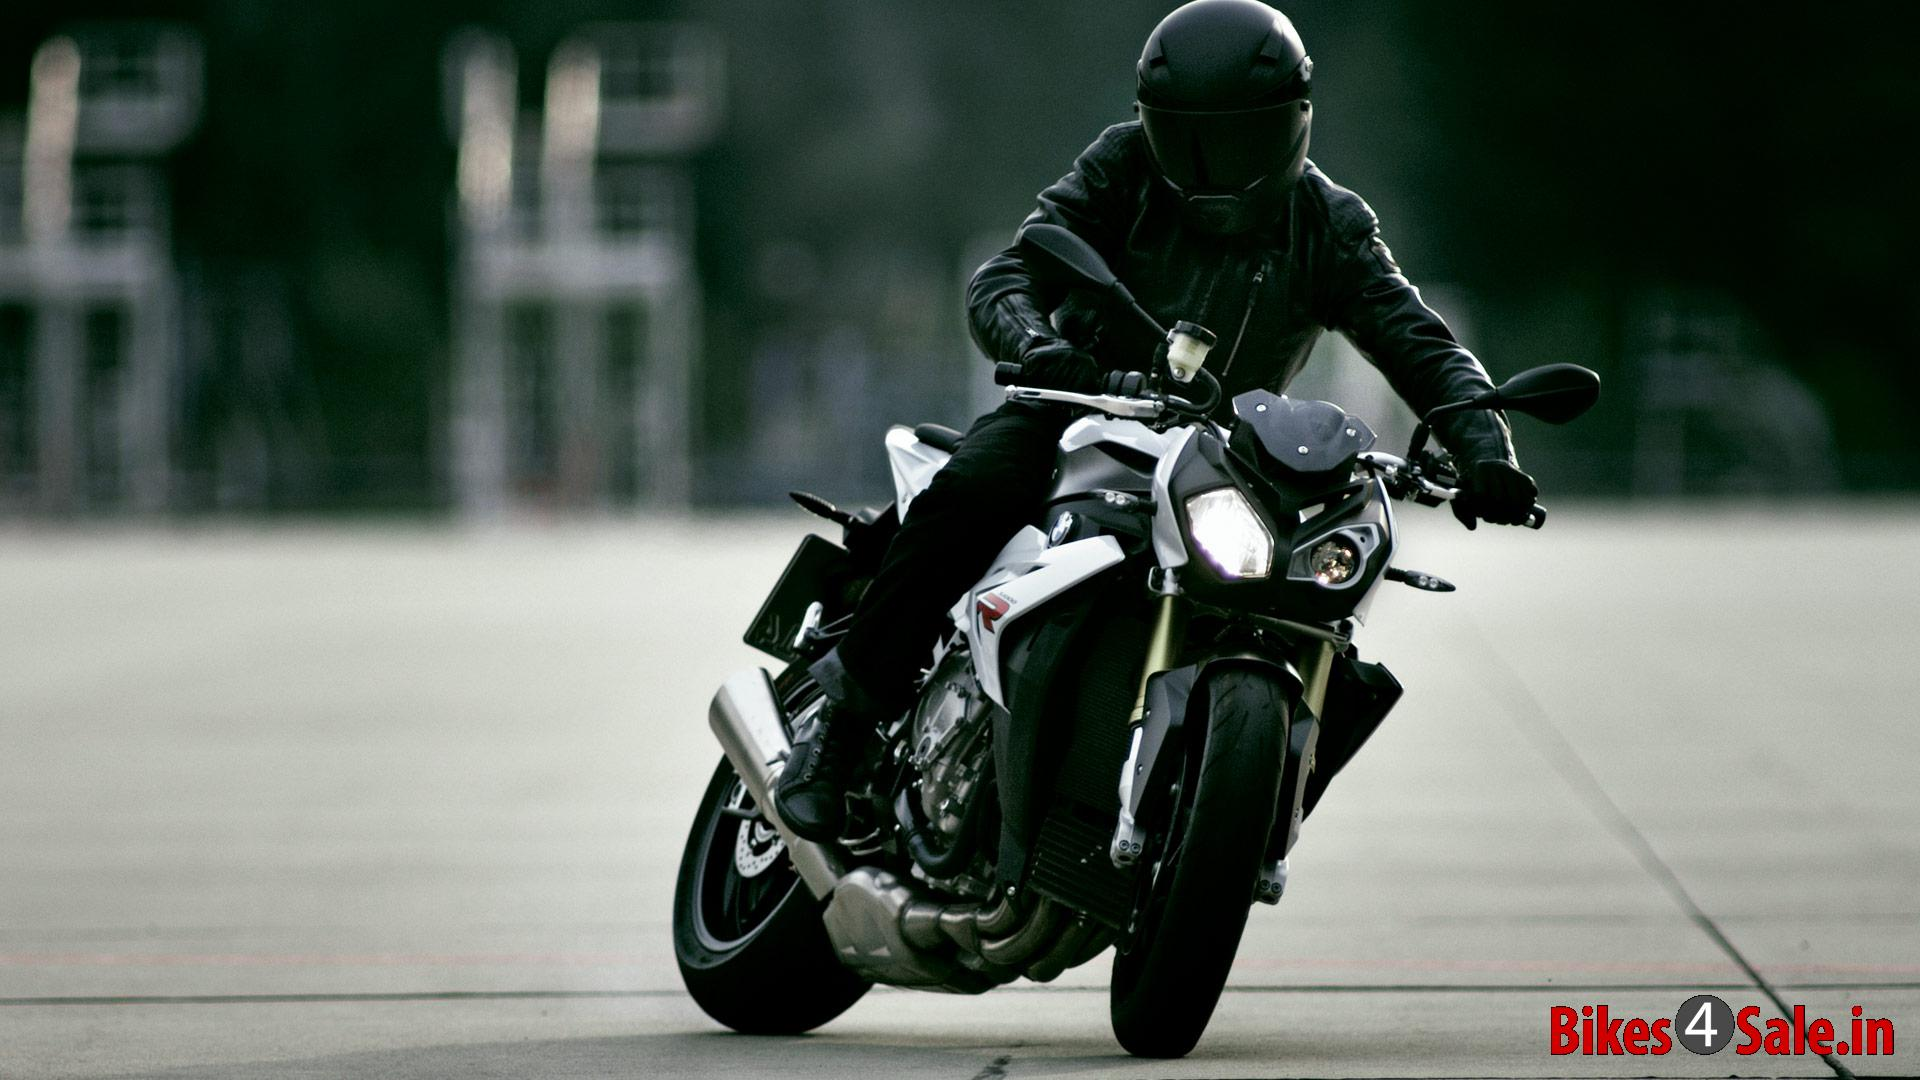 bmw s 1000 r price specs mileage colours photos and reviews bikes4sale. Black Bedroom Furniture Sets. Home Design Ideas